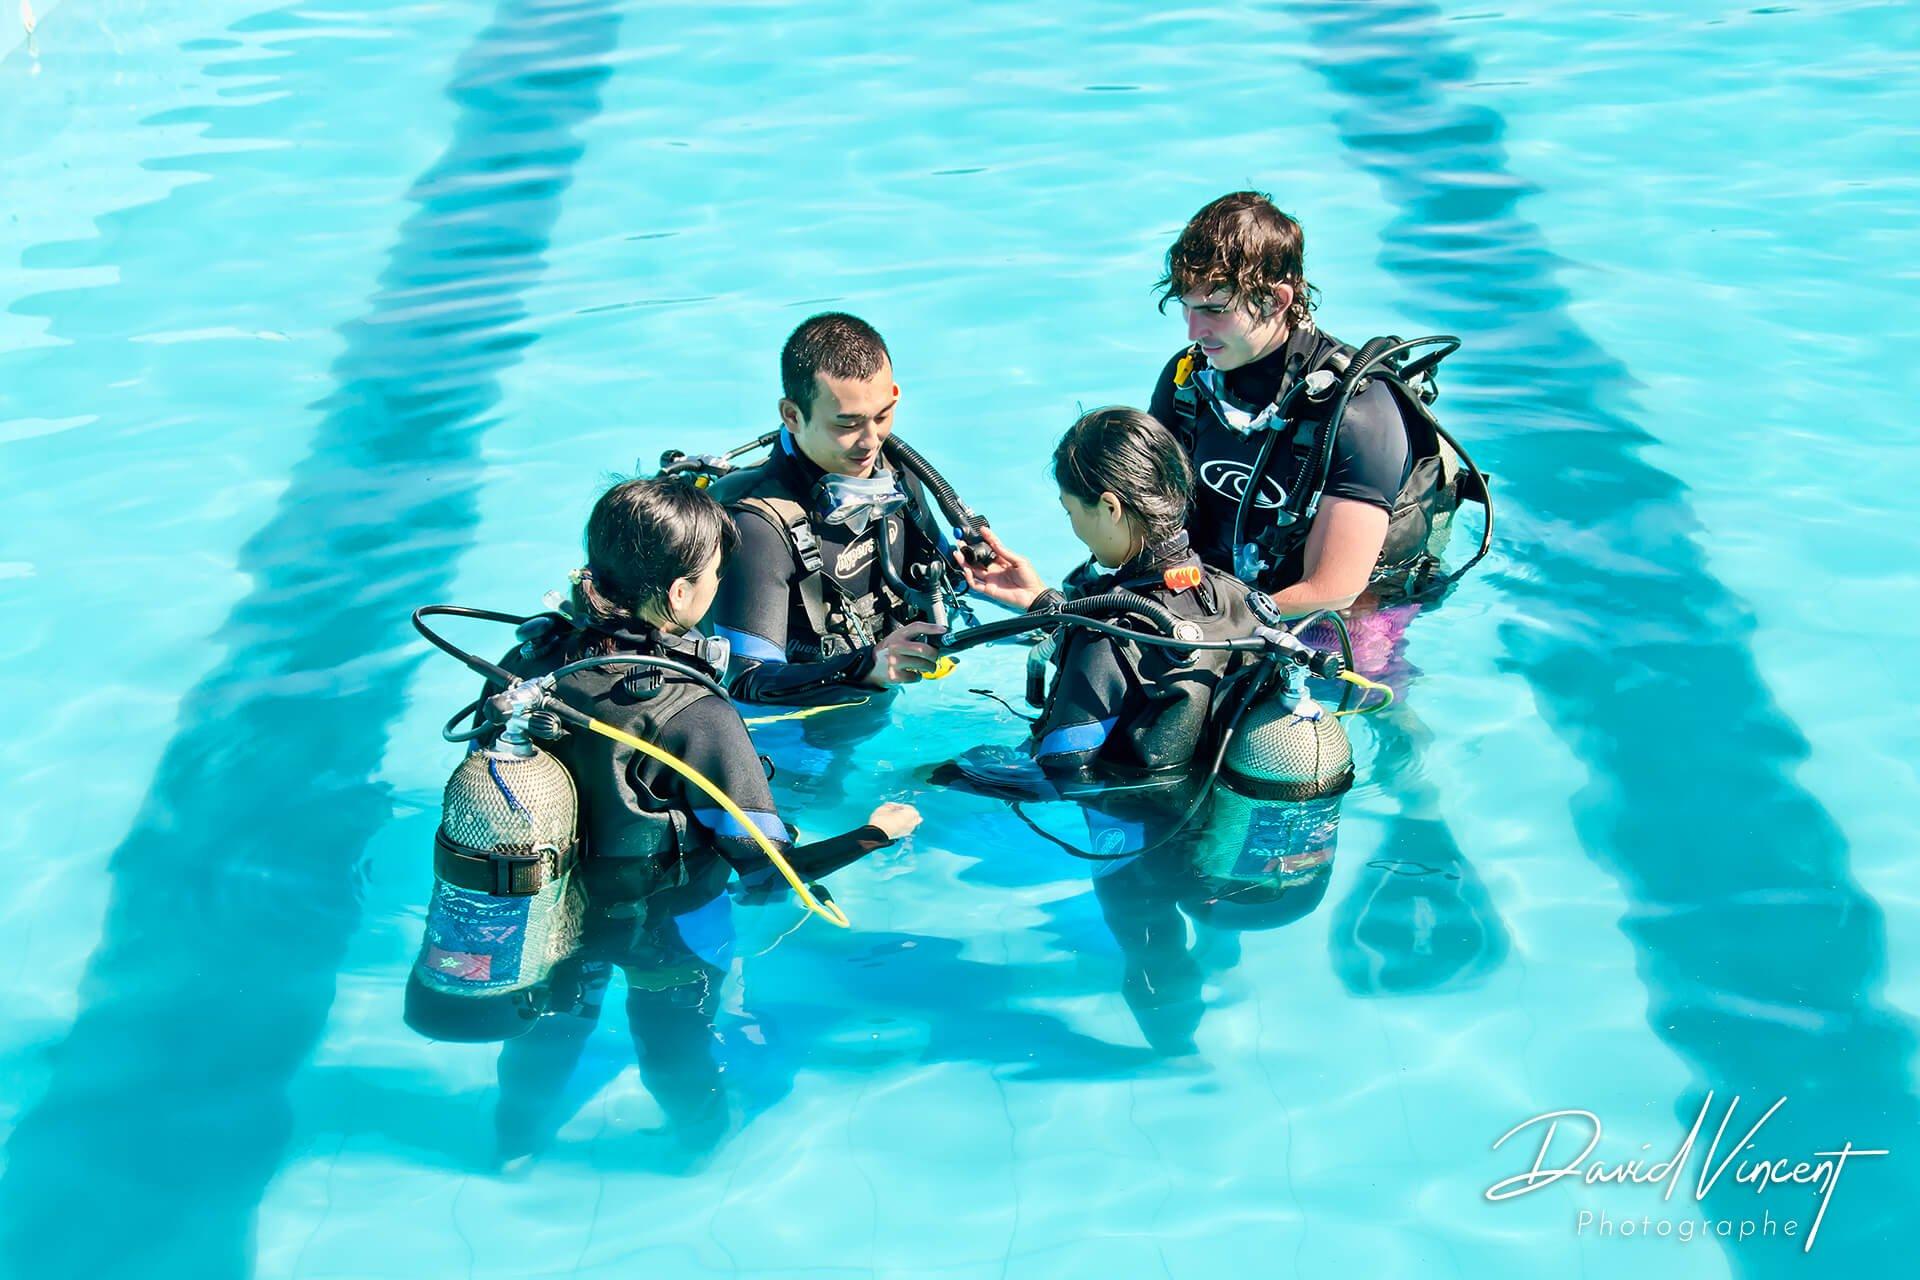 Dive Center Photographer